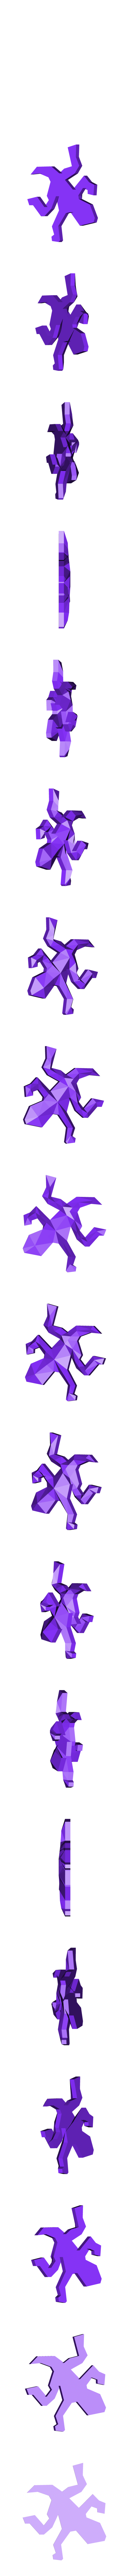 Escher_Lizard_LowPoly_Medium_ok.stl Download free STL file Escher Lizards • 3D printable model, Chrisibub